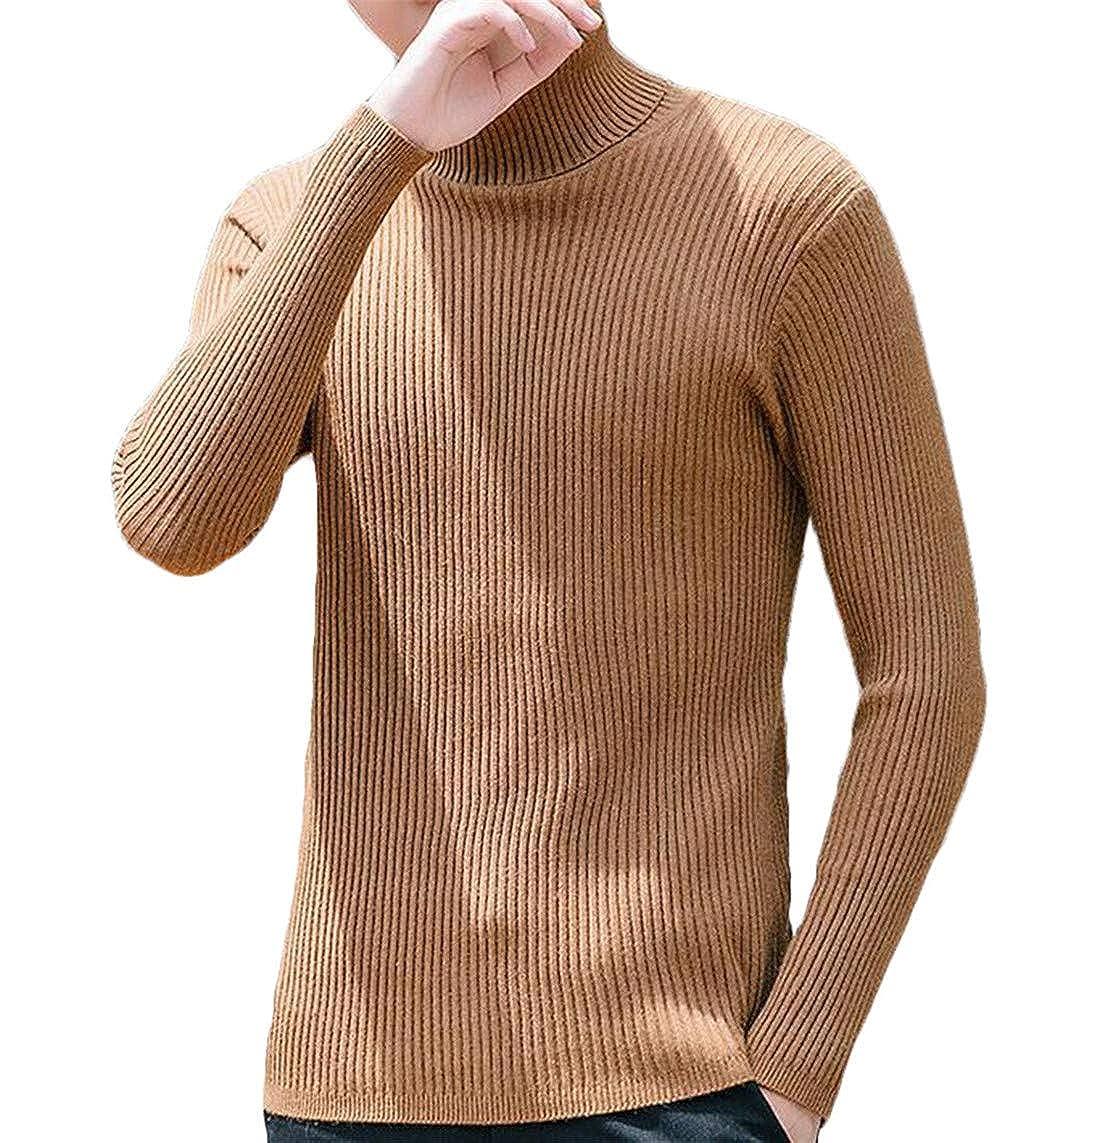 GRMO Men Slim Knit Long Sleeve Turtleneck Pullover Thermal Sweater